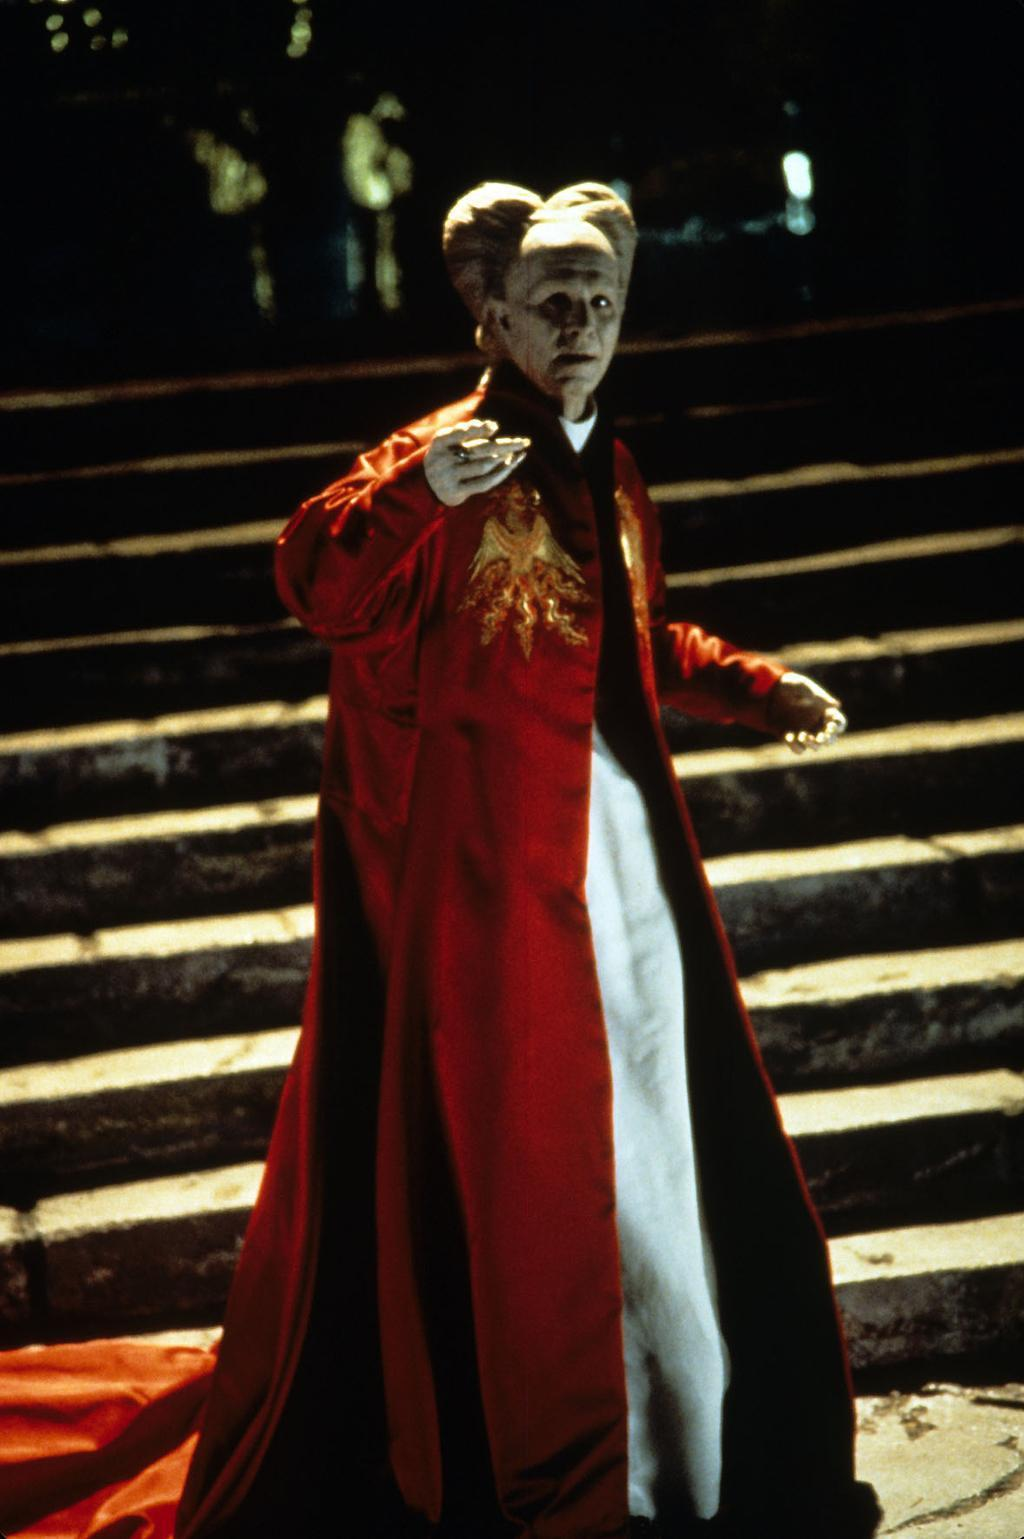 The making of Dracula: How Bram Stoker's 'in-betweener' status inspired horror